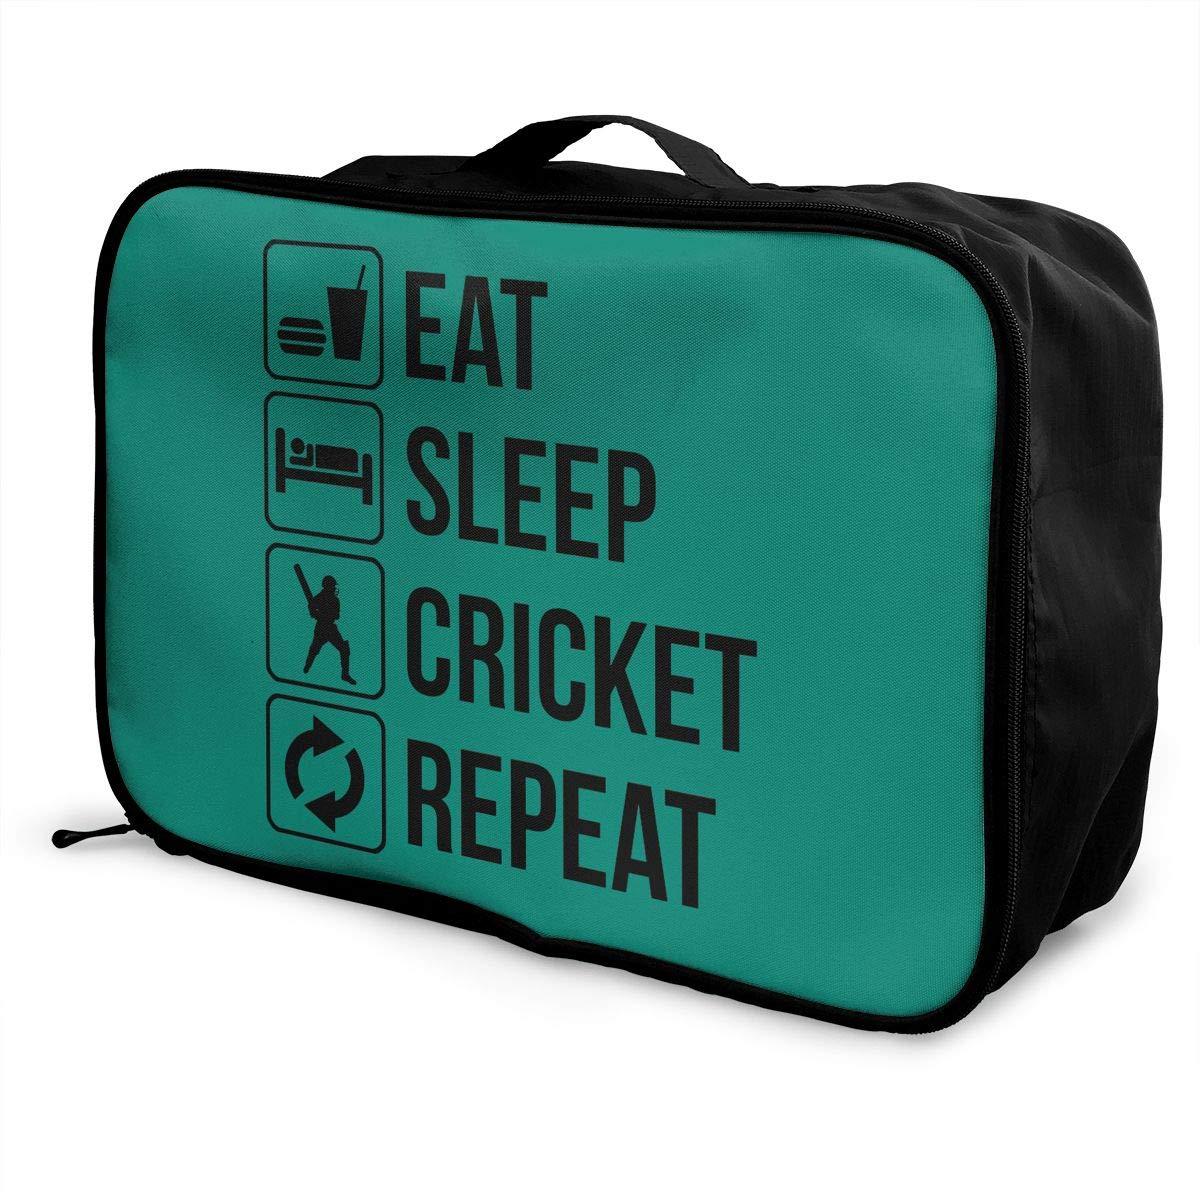 Travel Luggage Duffle Bag Lightweight Portable Handbag Eat Sleep Cricket Large Capacity Waterproof Foldable Storage Tote